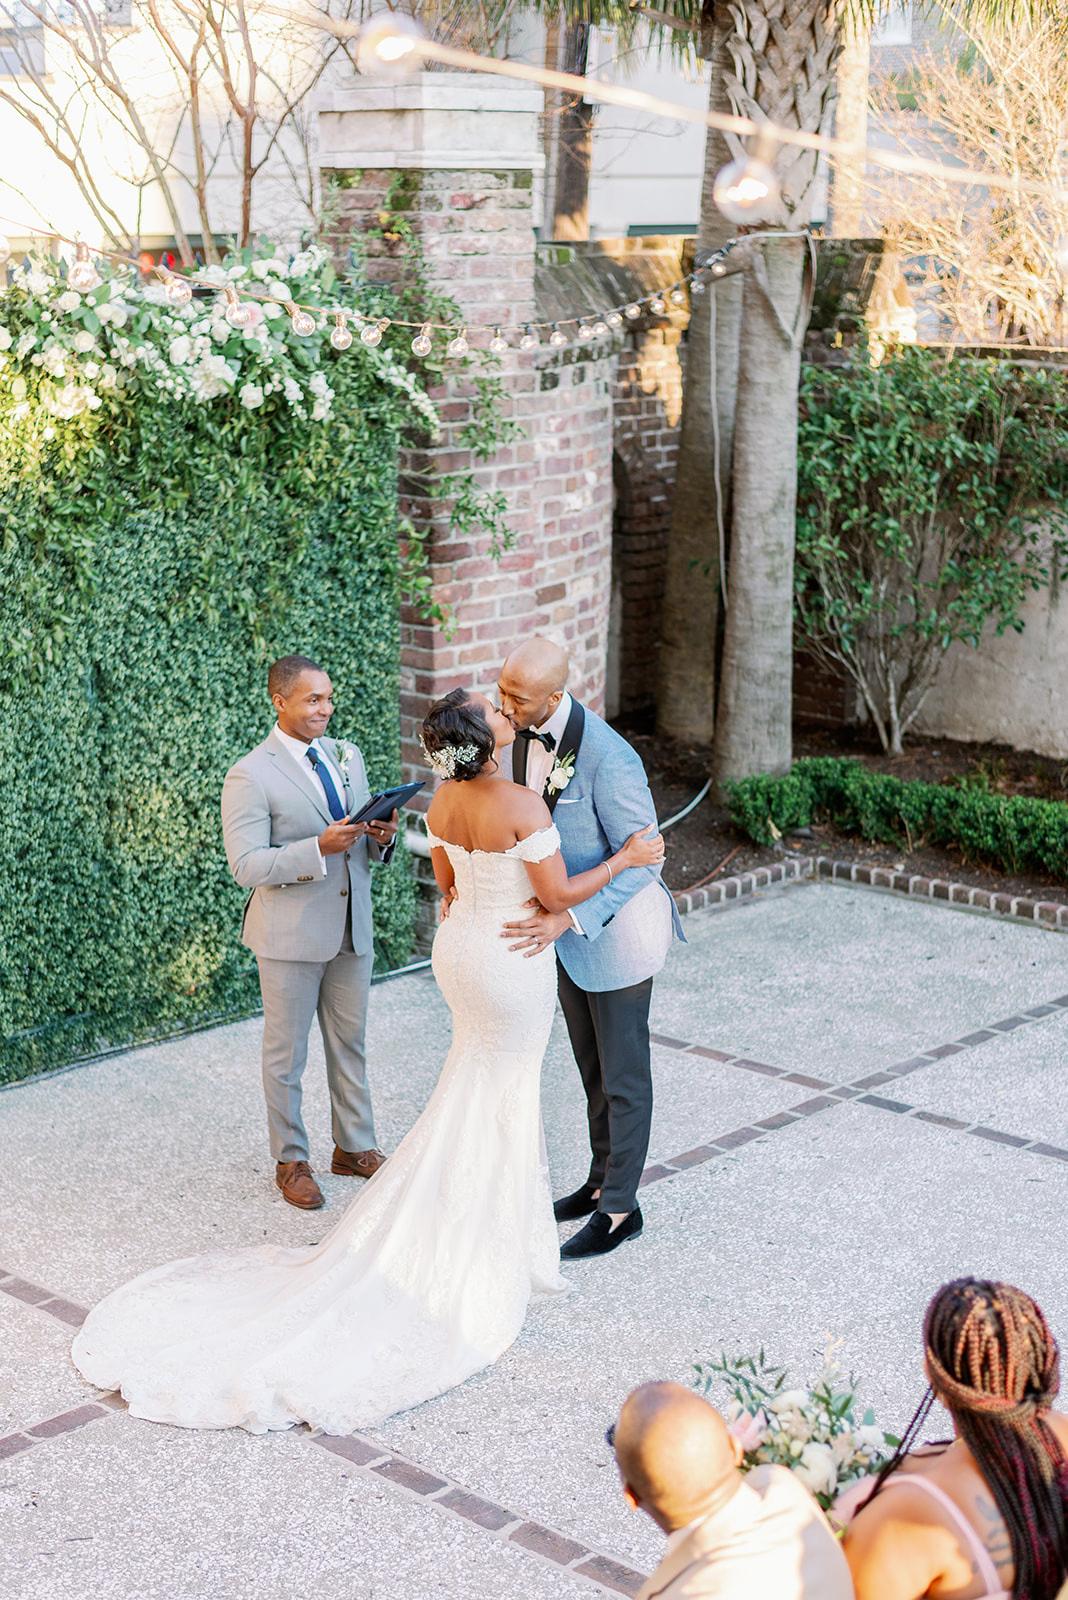 Couple getting married in ourdoor courtyard